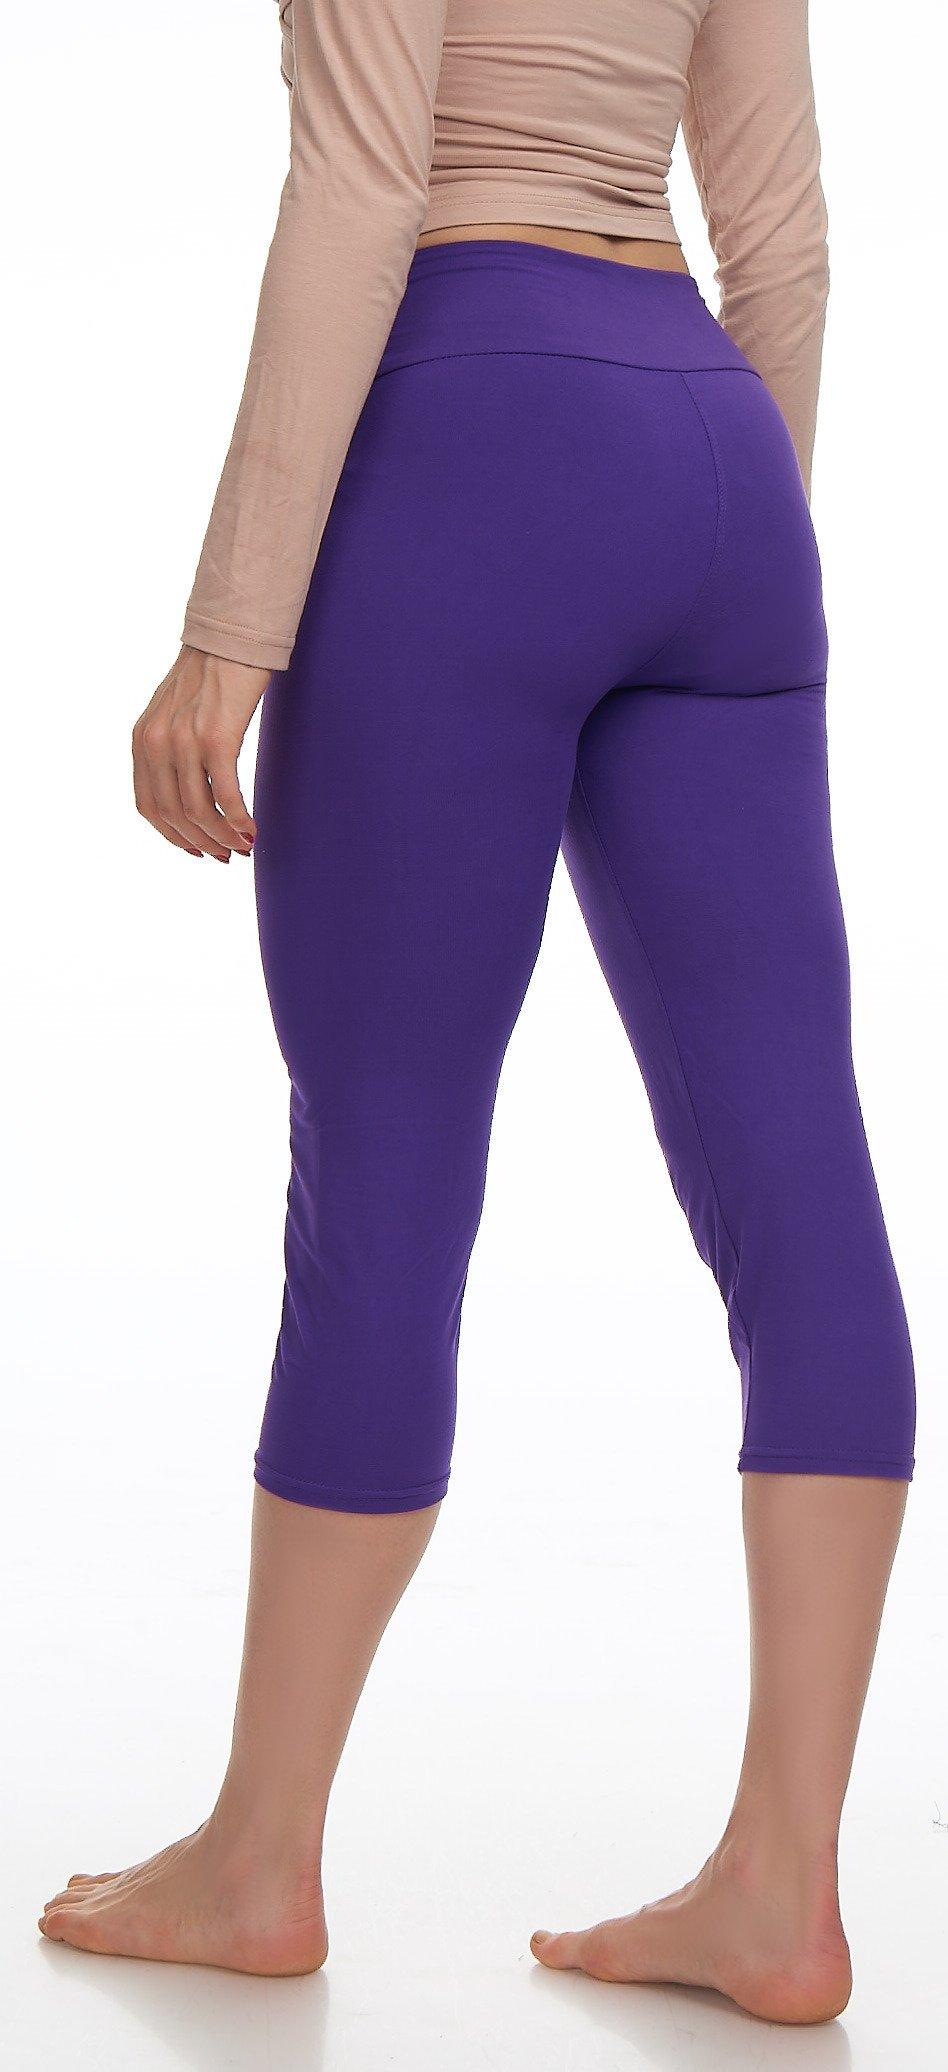 Lush Moda Extra Soft Leggings Variety of ColorsPlus Size Yoga Waist Purple, One Size fits Most (XL 3XL), Purple Yoga Waist by LMB (Image #8)